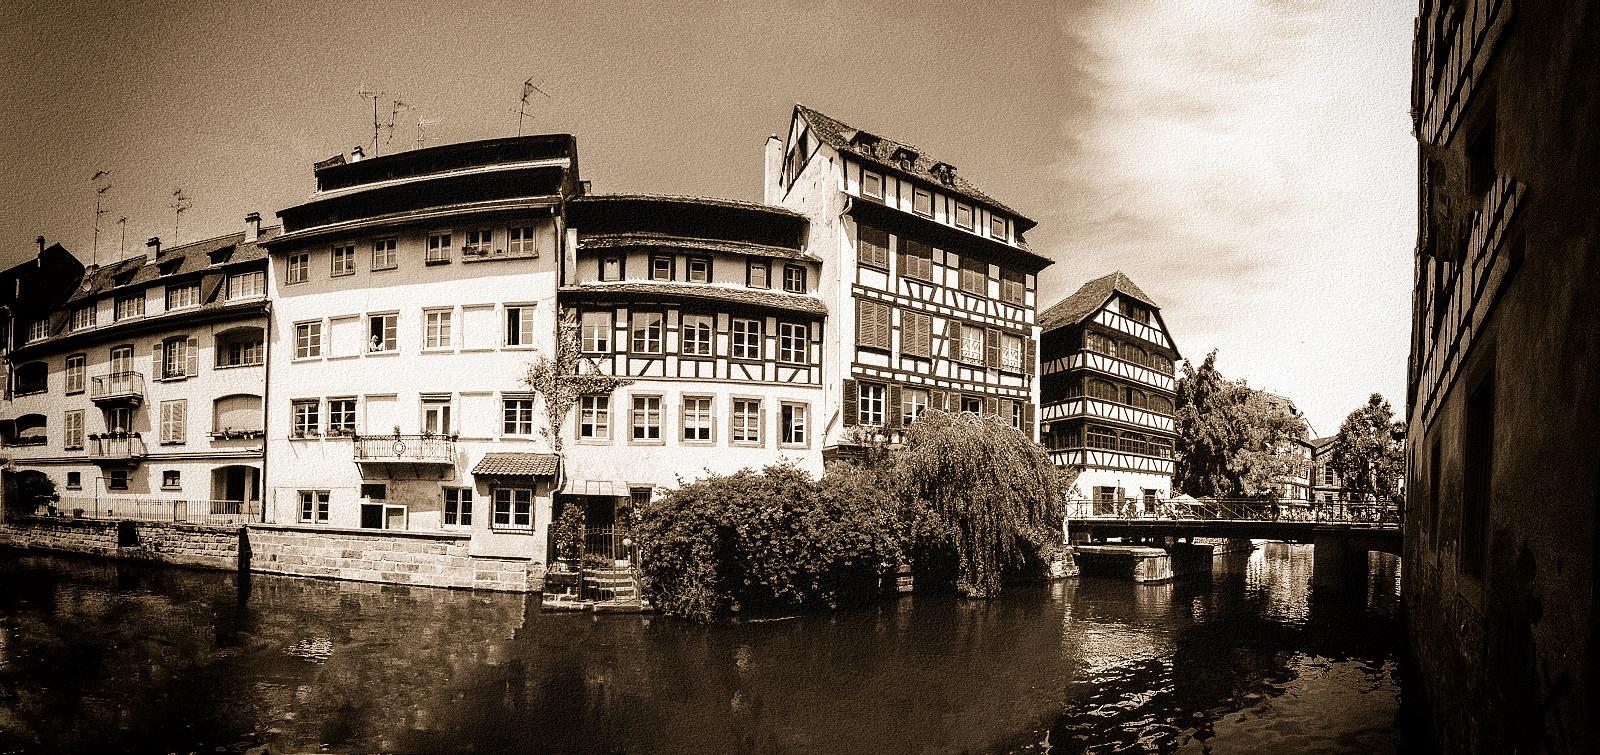 Strasbourg City by Milan